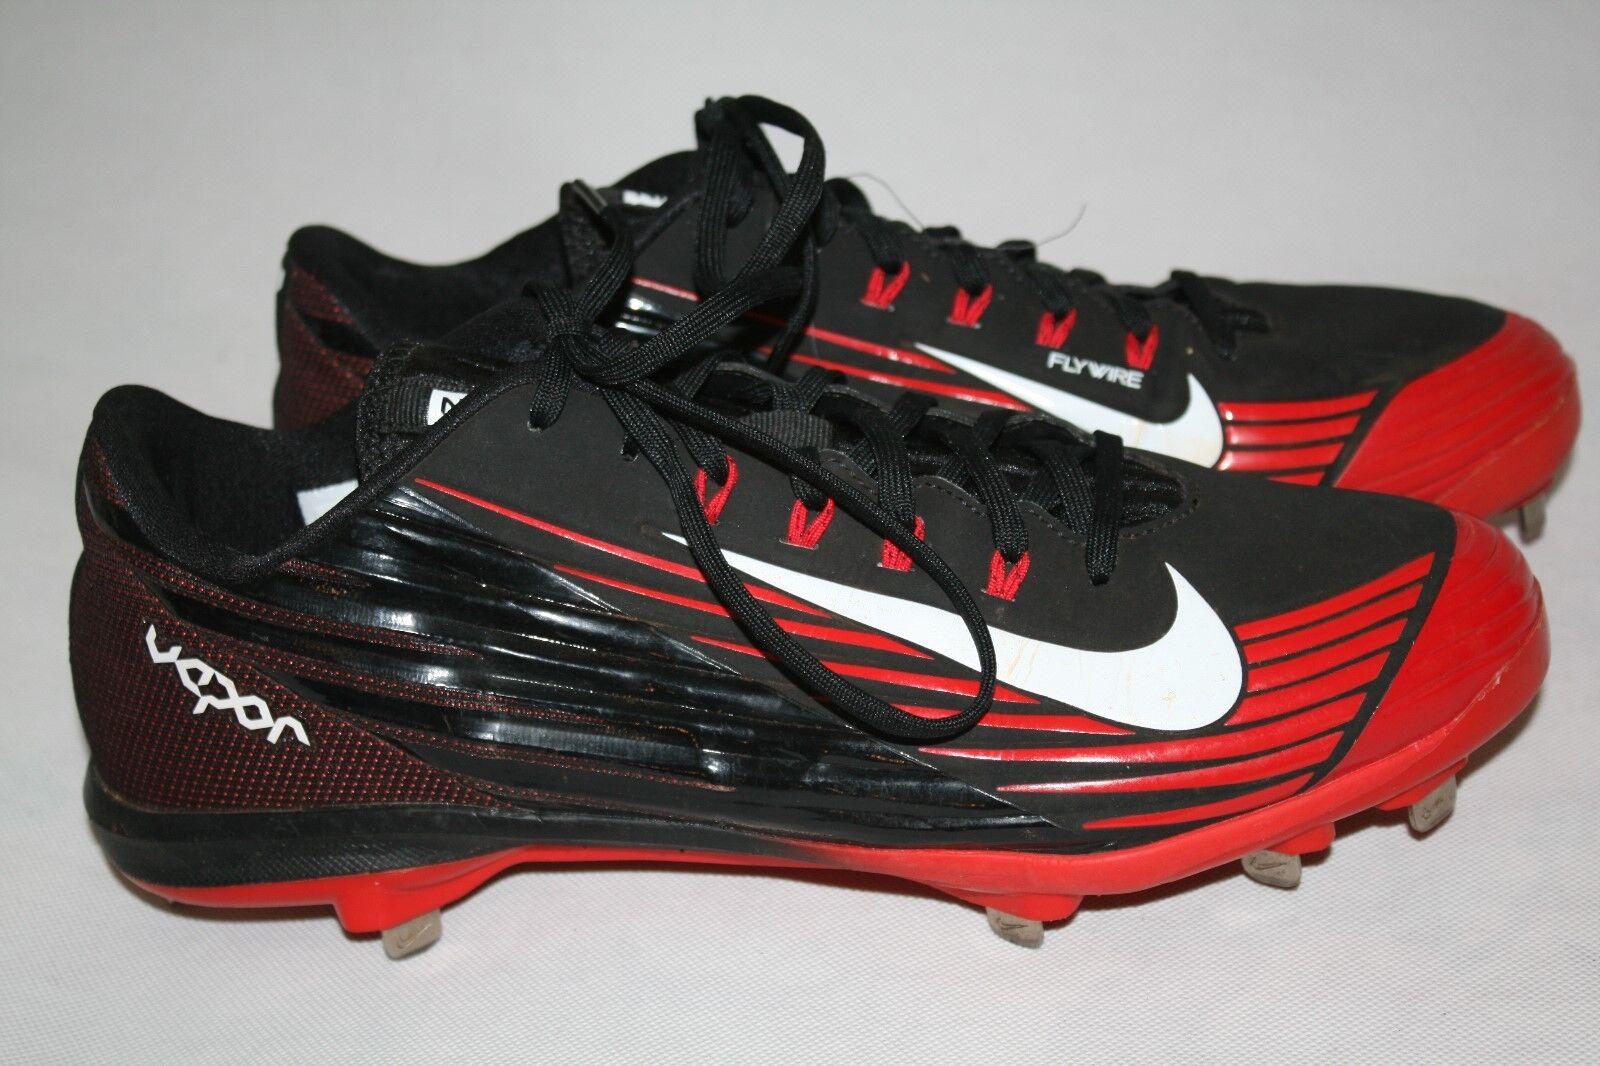 Nike Vapor BSBL Metal Cleats Lunarlon Flywire 683895-016 Mens Red Black Sz 11.5  Seasonal price cuts, discount benefits